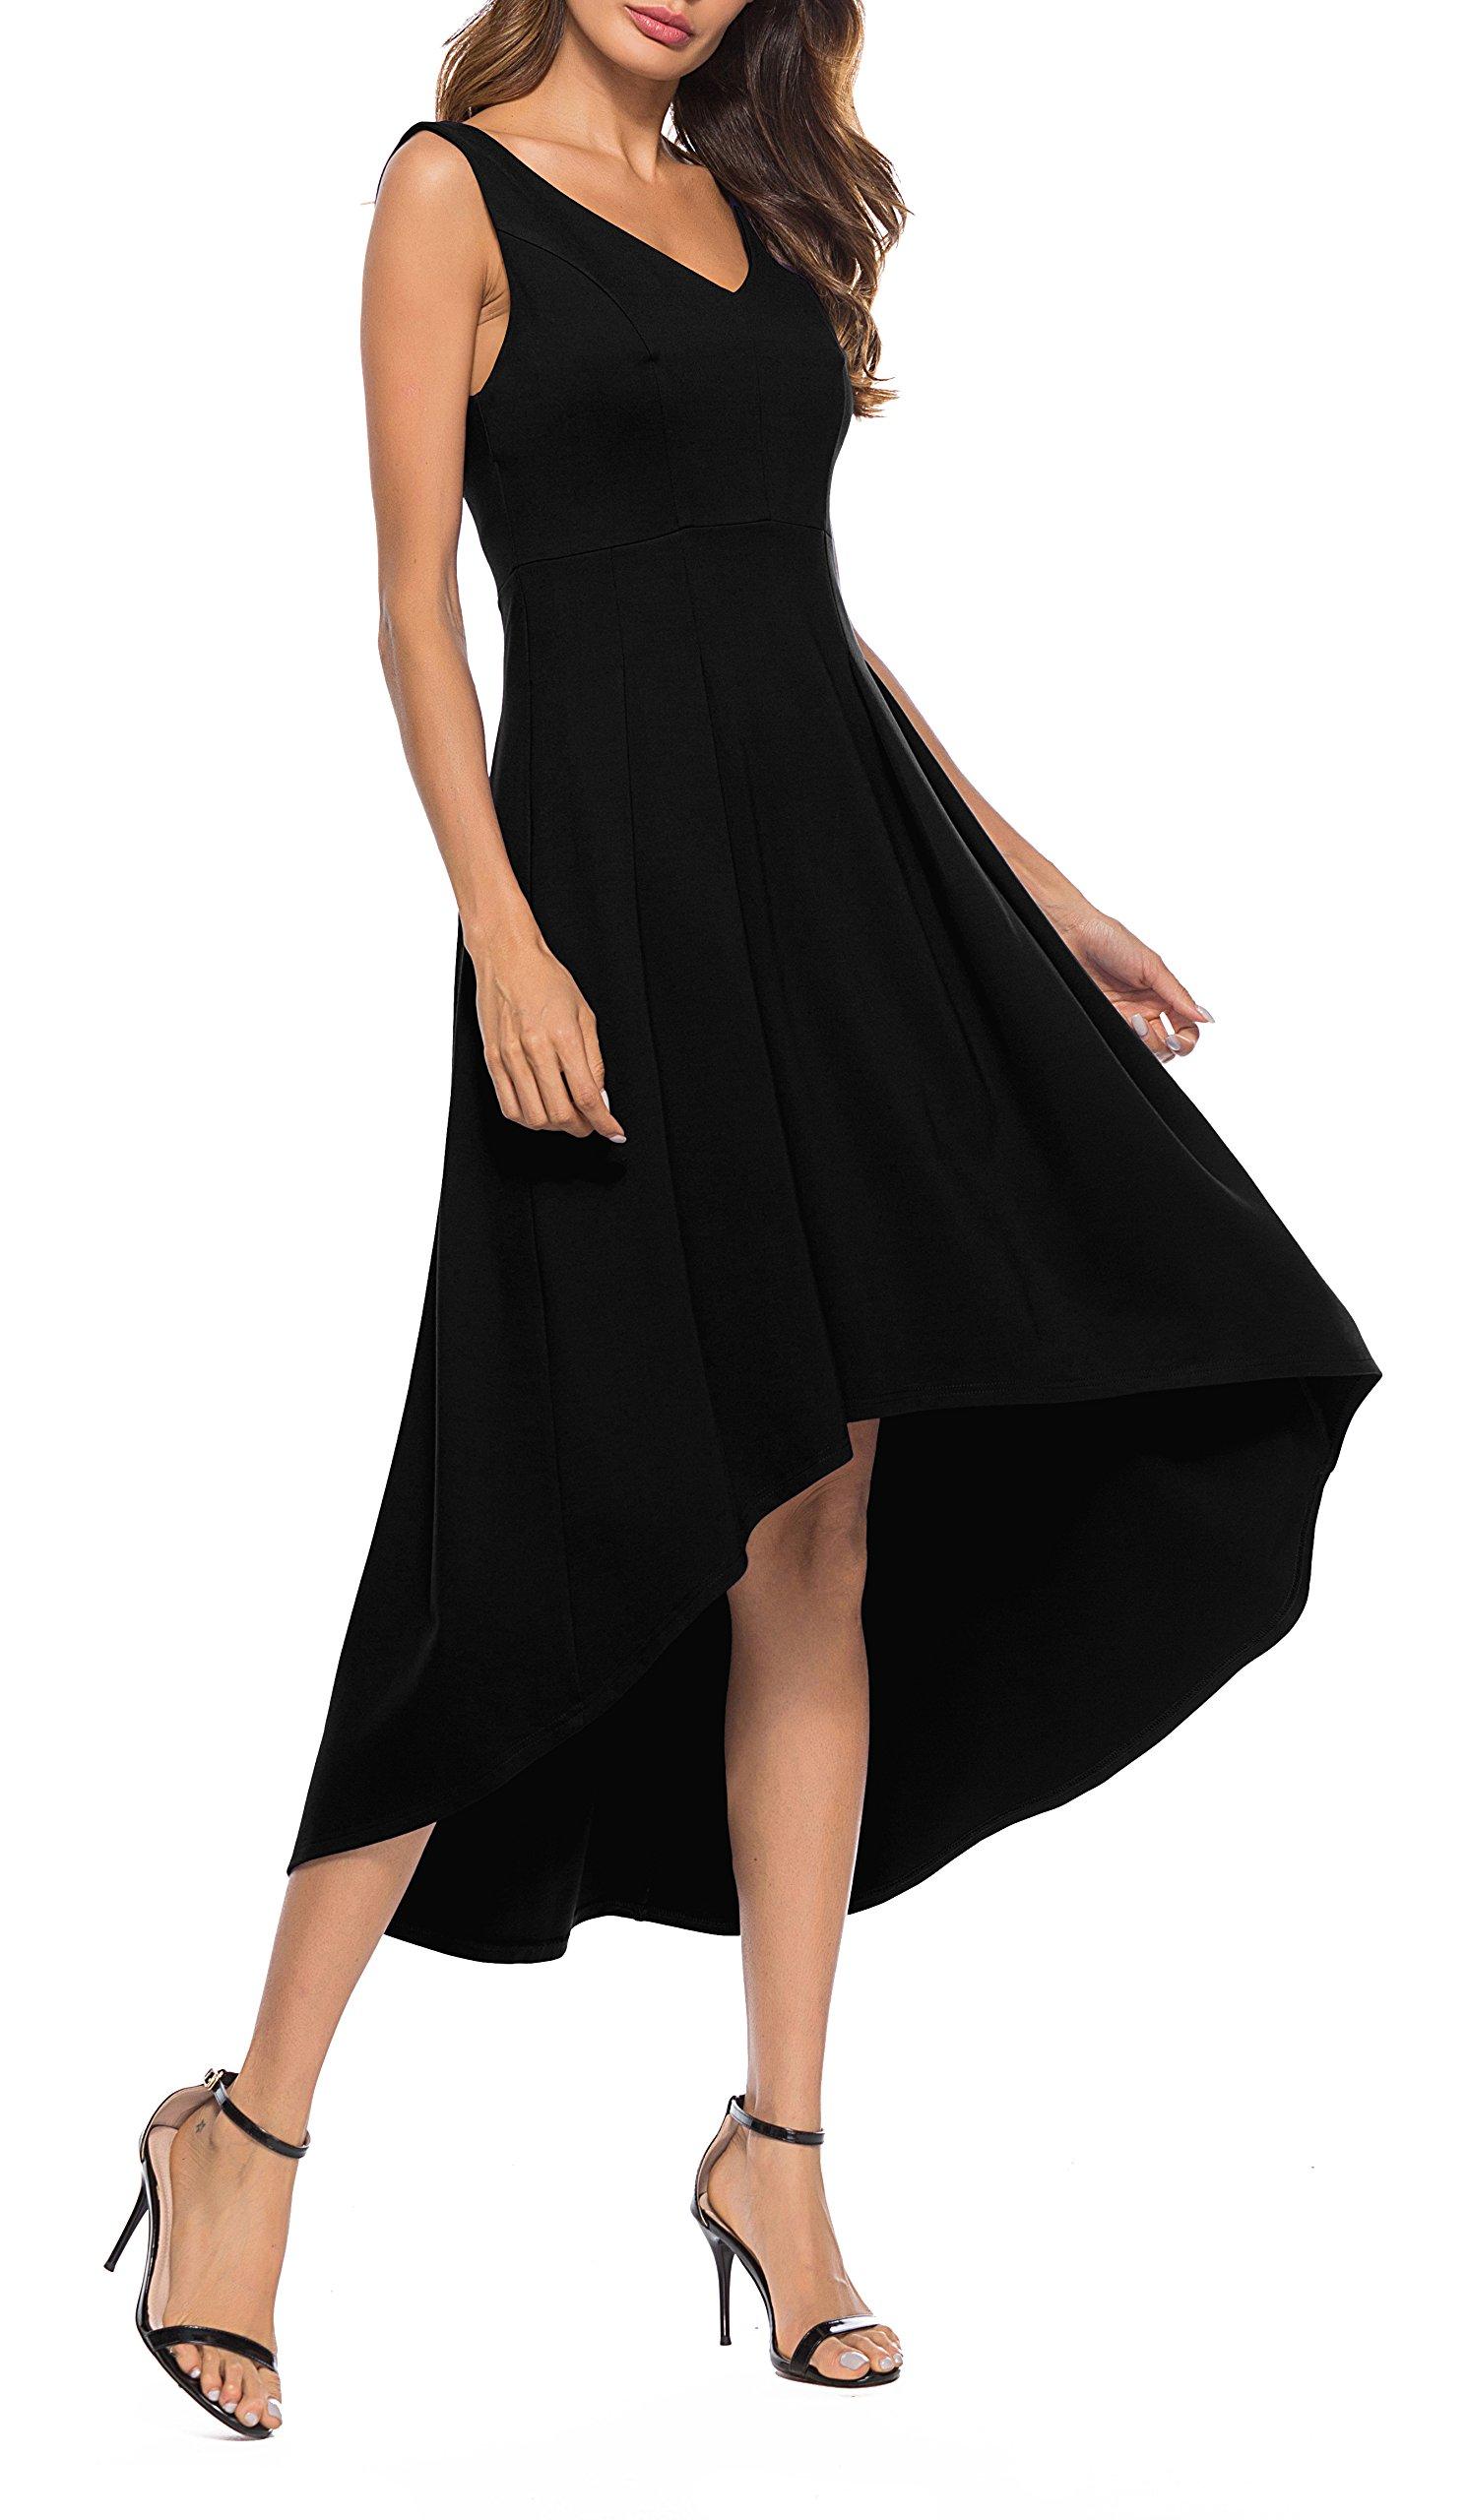 Sarin Mathews Womens V Neck High Low Cocktail Party Dress Sleeveless Casual Long Maxi Dresses Black L